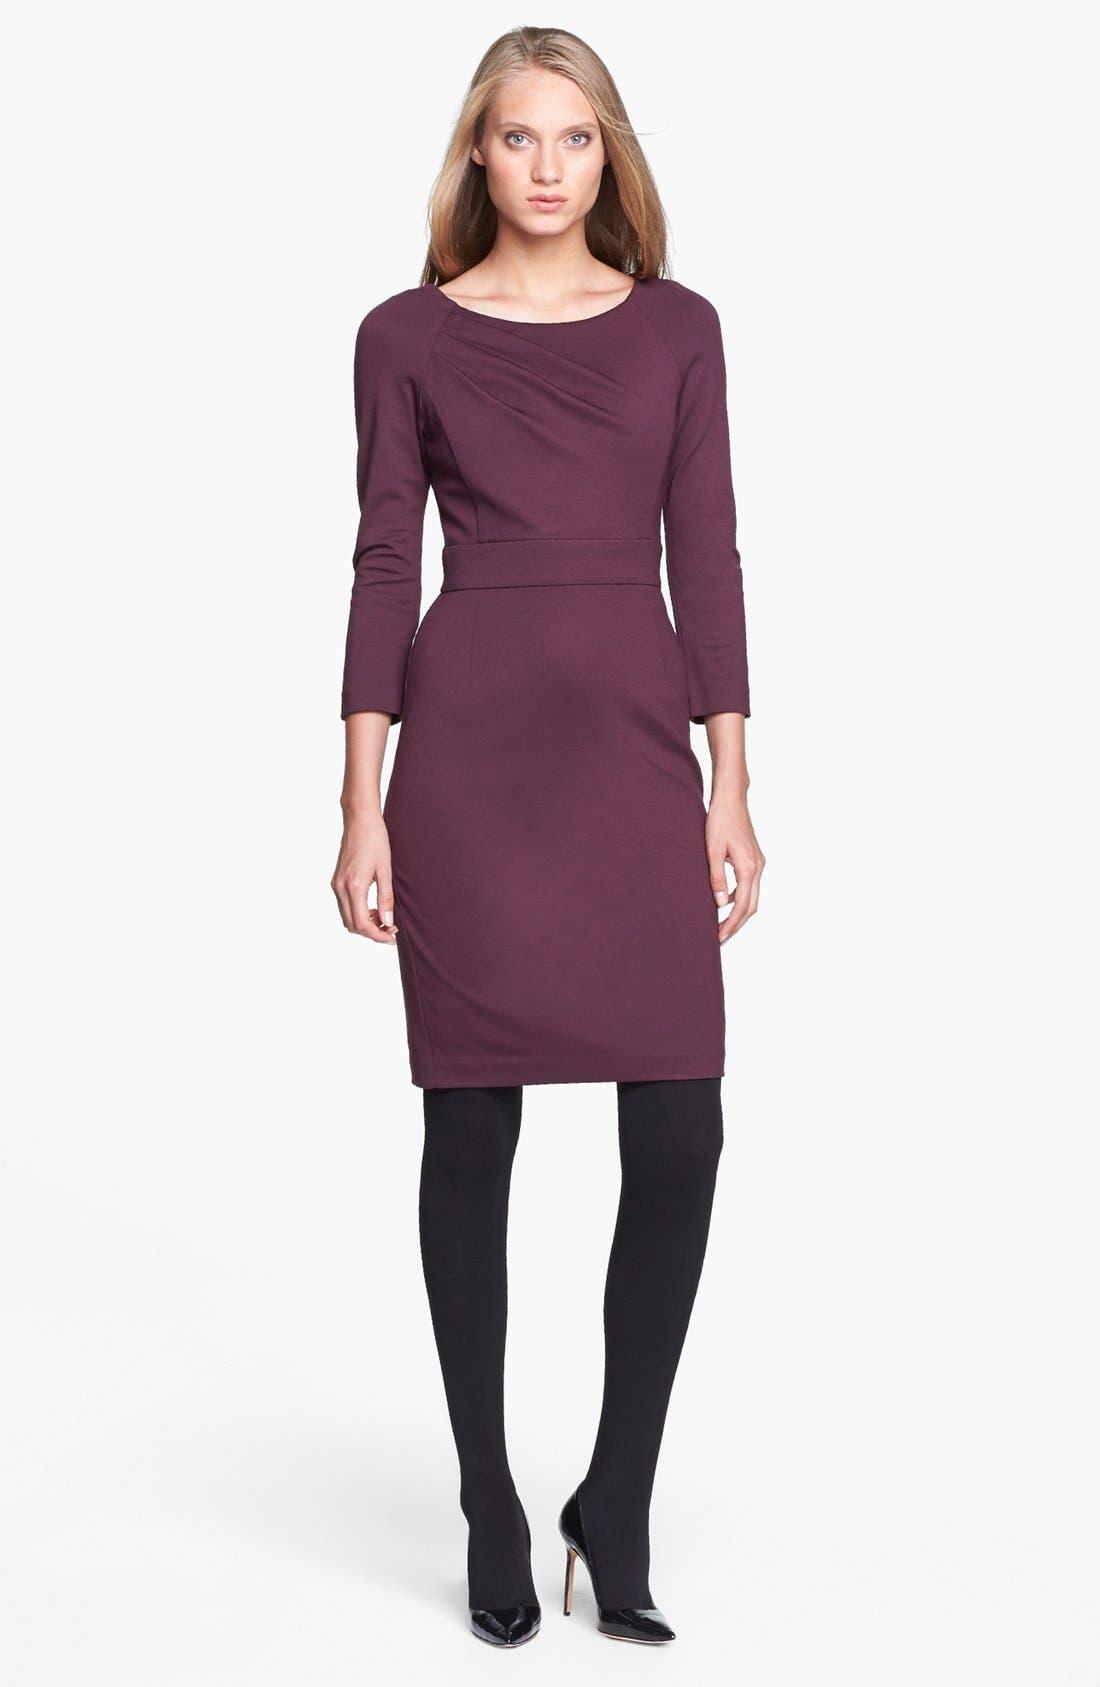 Alternate Image 1 Selected - Trina Turk 'Fenella' Ponte Sheath Dress